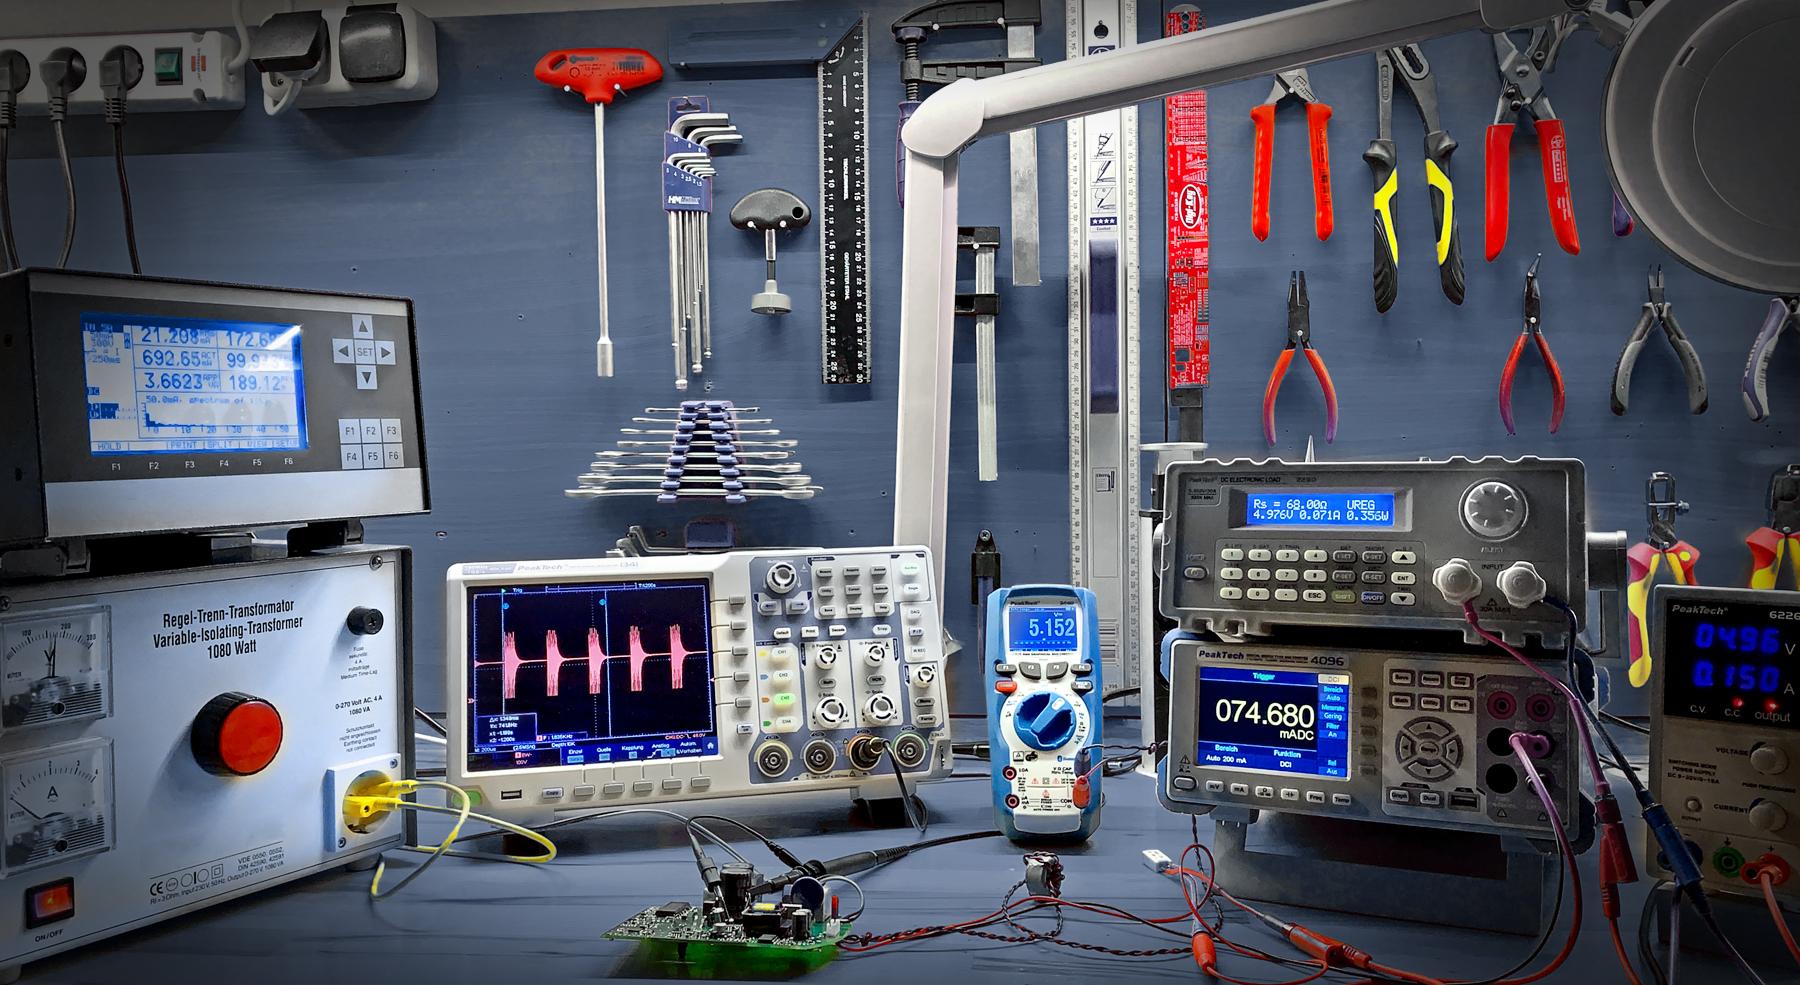 Workshop equipment for electronics